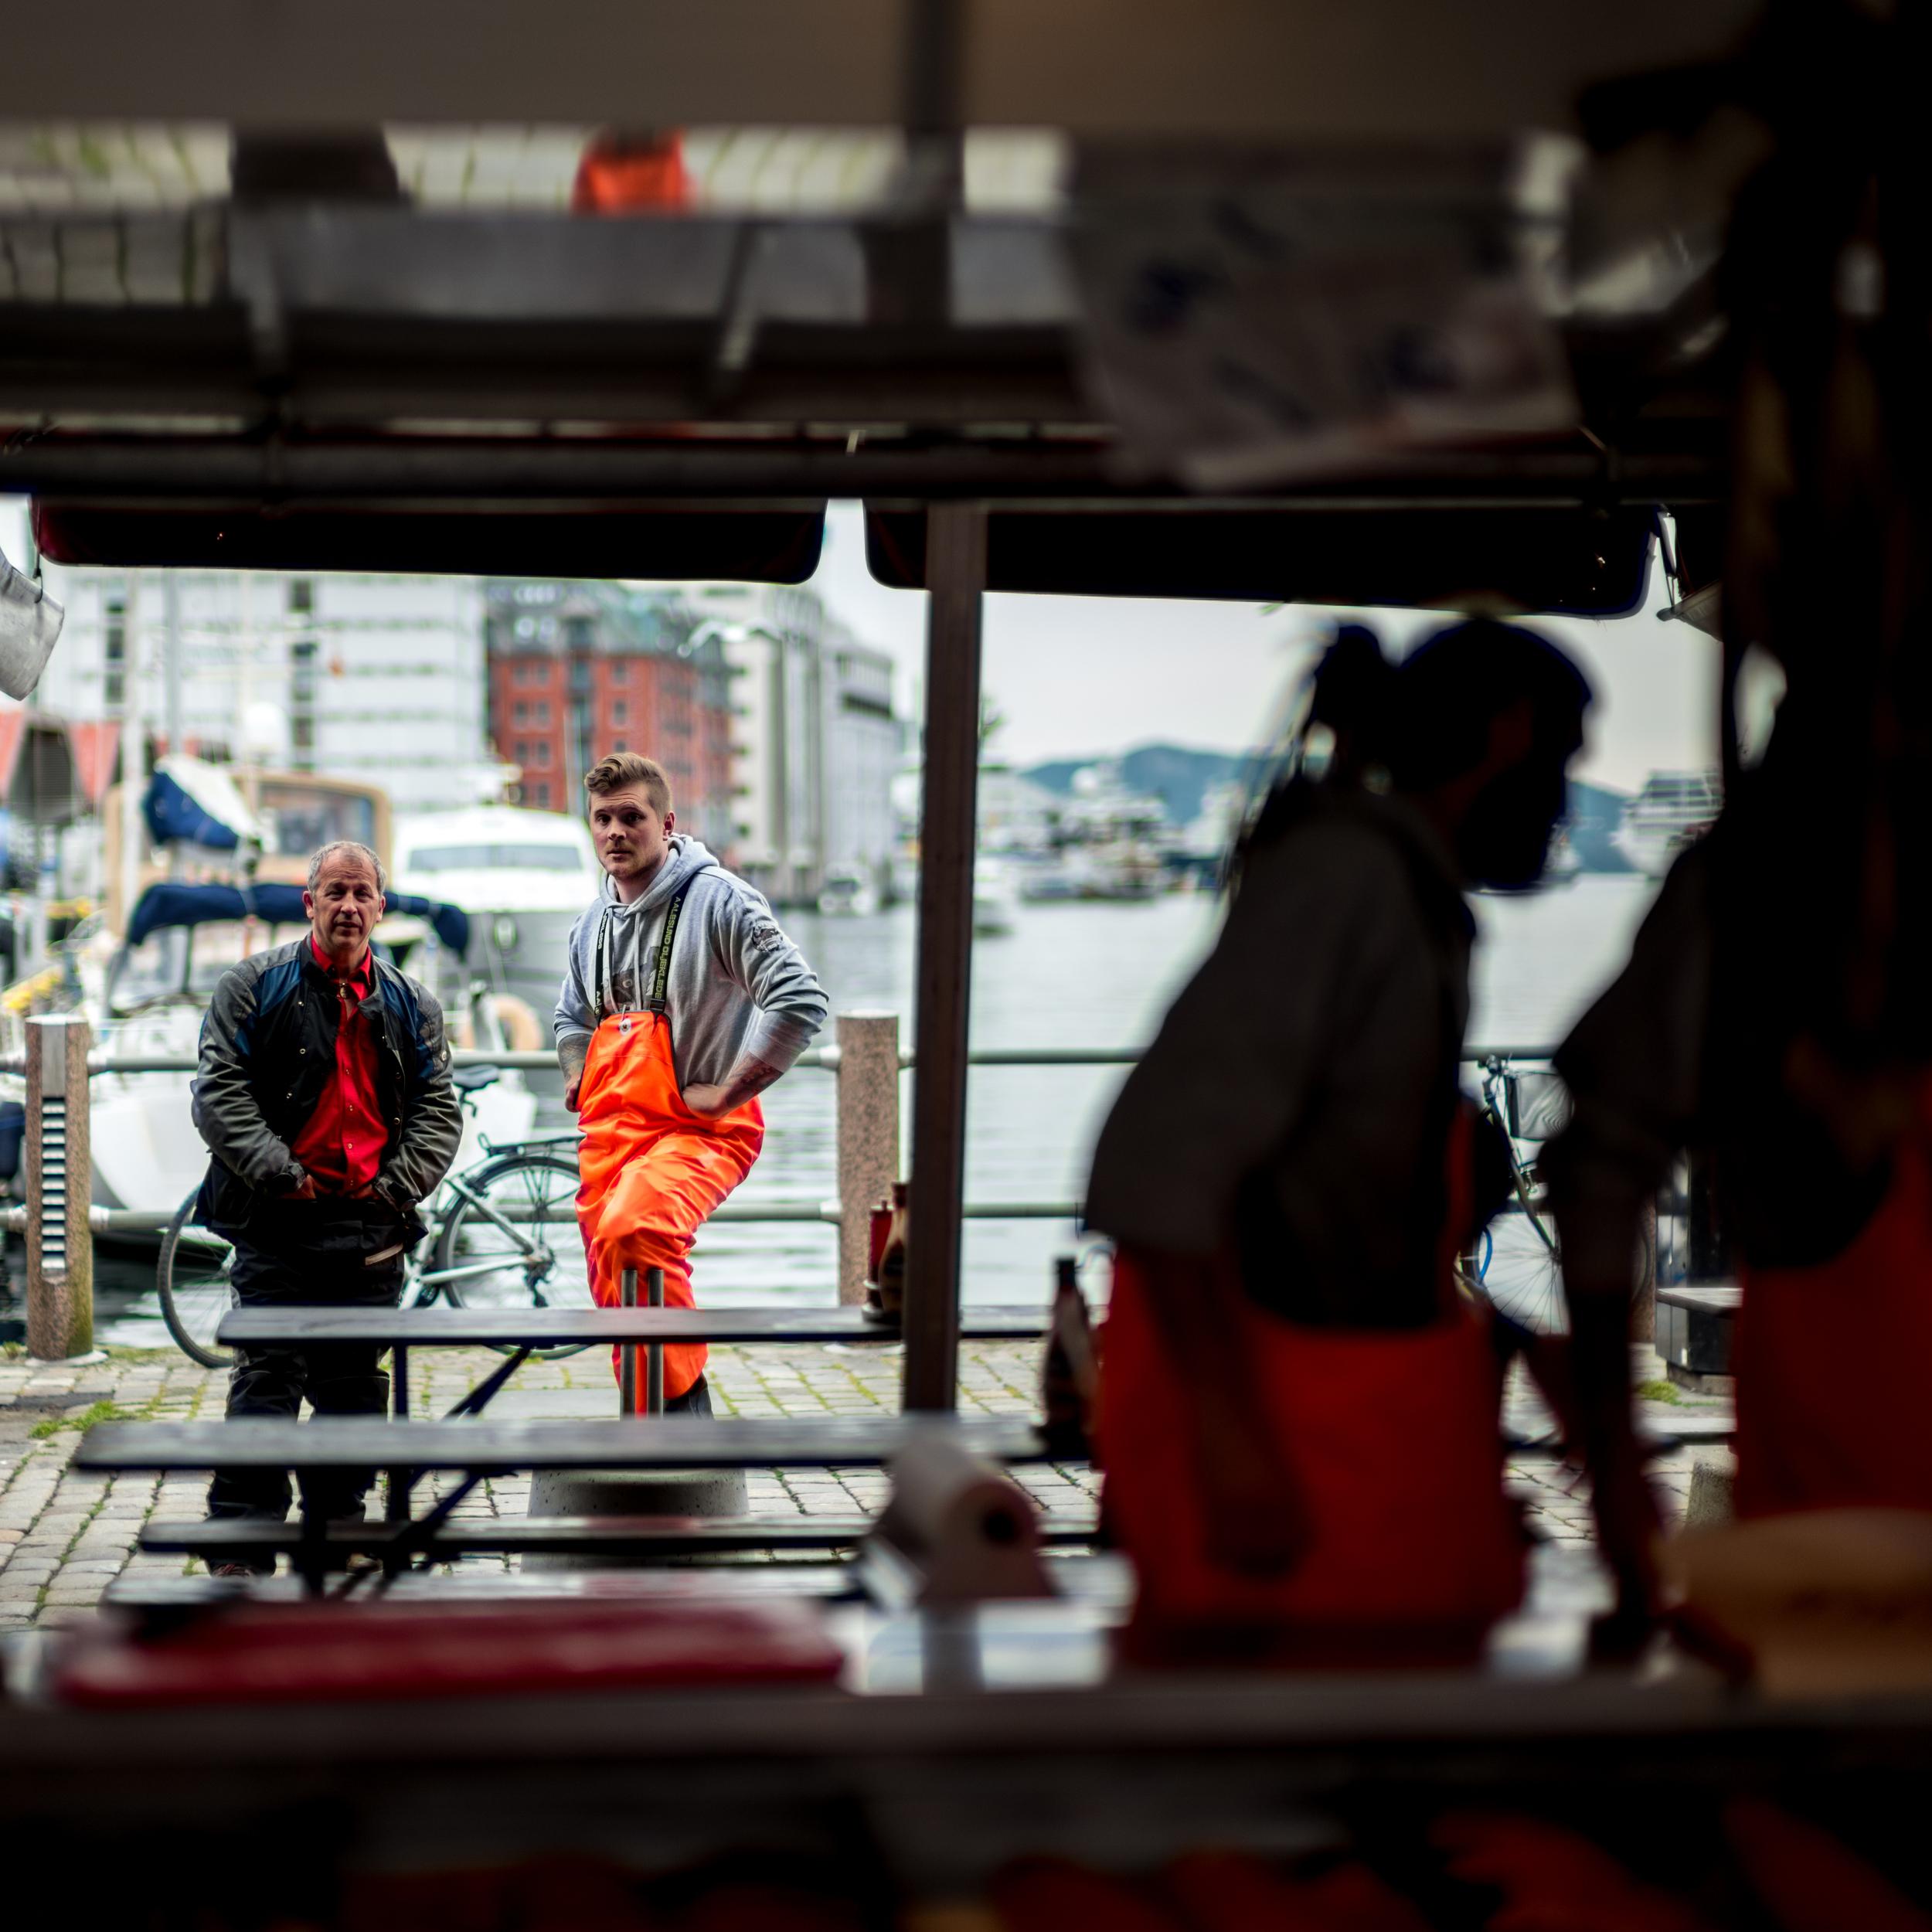 Some fishermen stop for a break in the markets of Bergen, Norway.